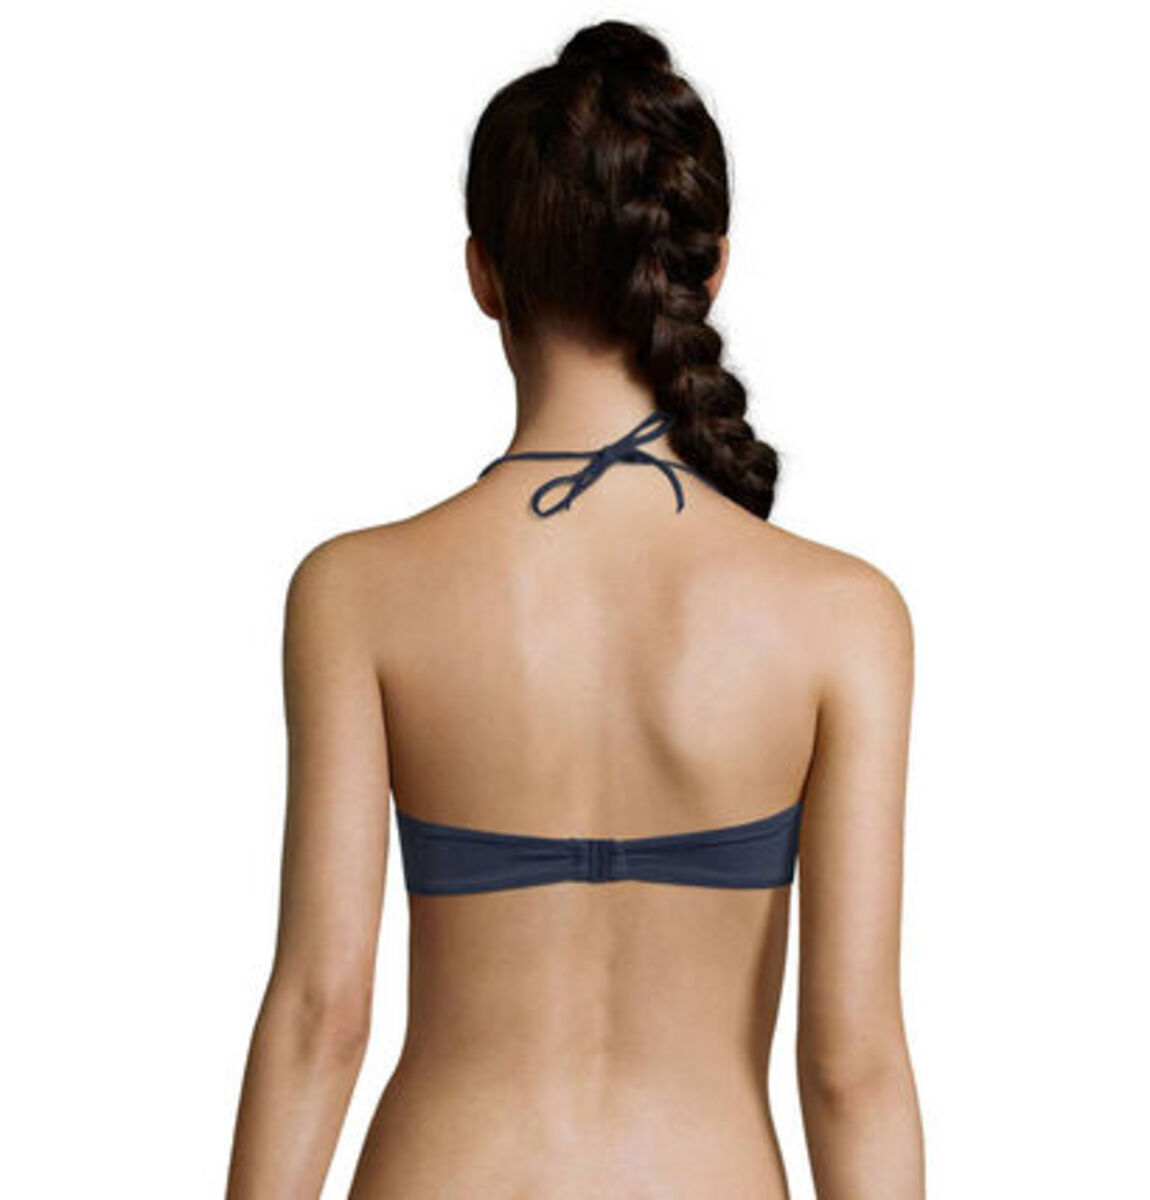 Bild 2 von Tommy Hilfiger Bikini Oberteil, Bandeau, abnehmbarer Träger, Wattierung herausnehmbar